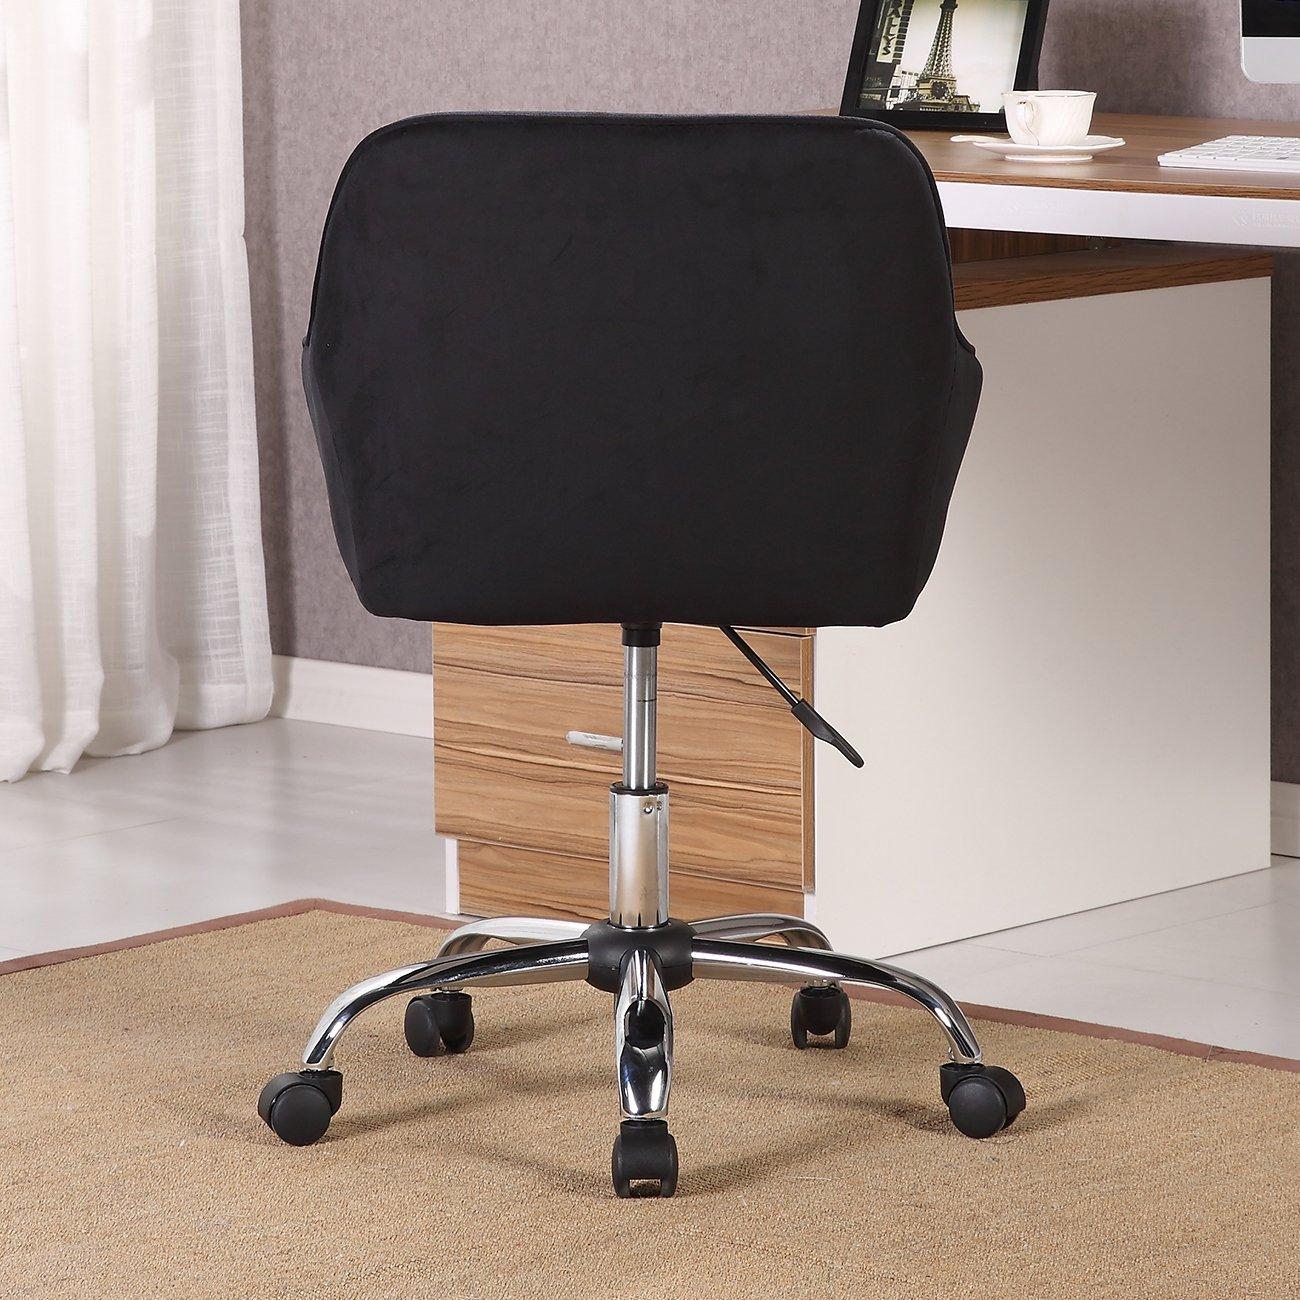 Shop Belleze Modern Office Chair Task Desk Adjustable Swivel Height Intended For Katrina Blue Swivel Glider Chairs (Image 20 of 25)